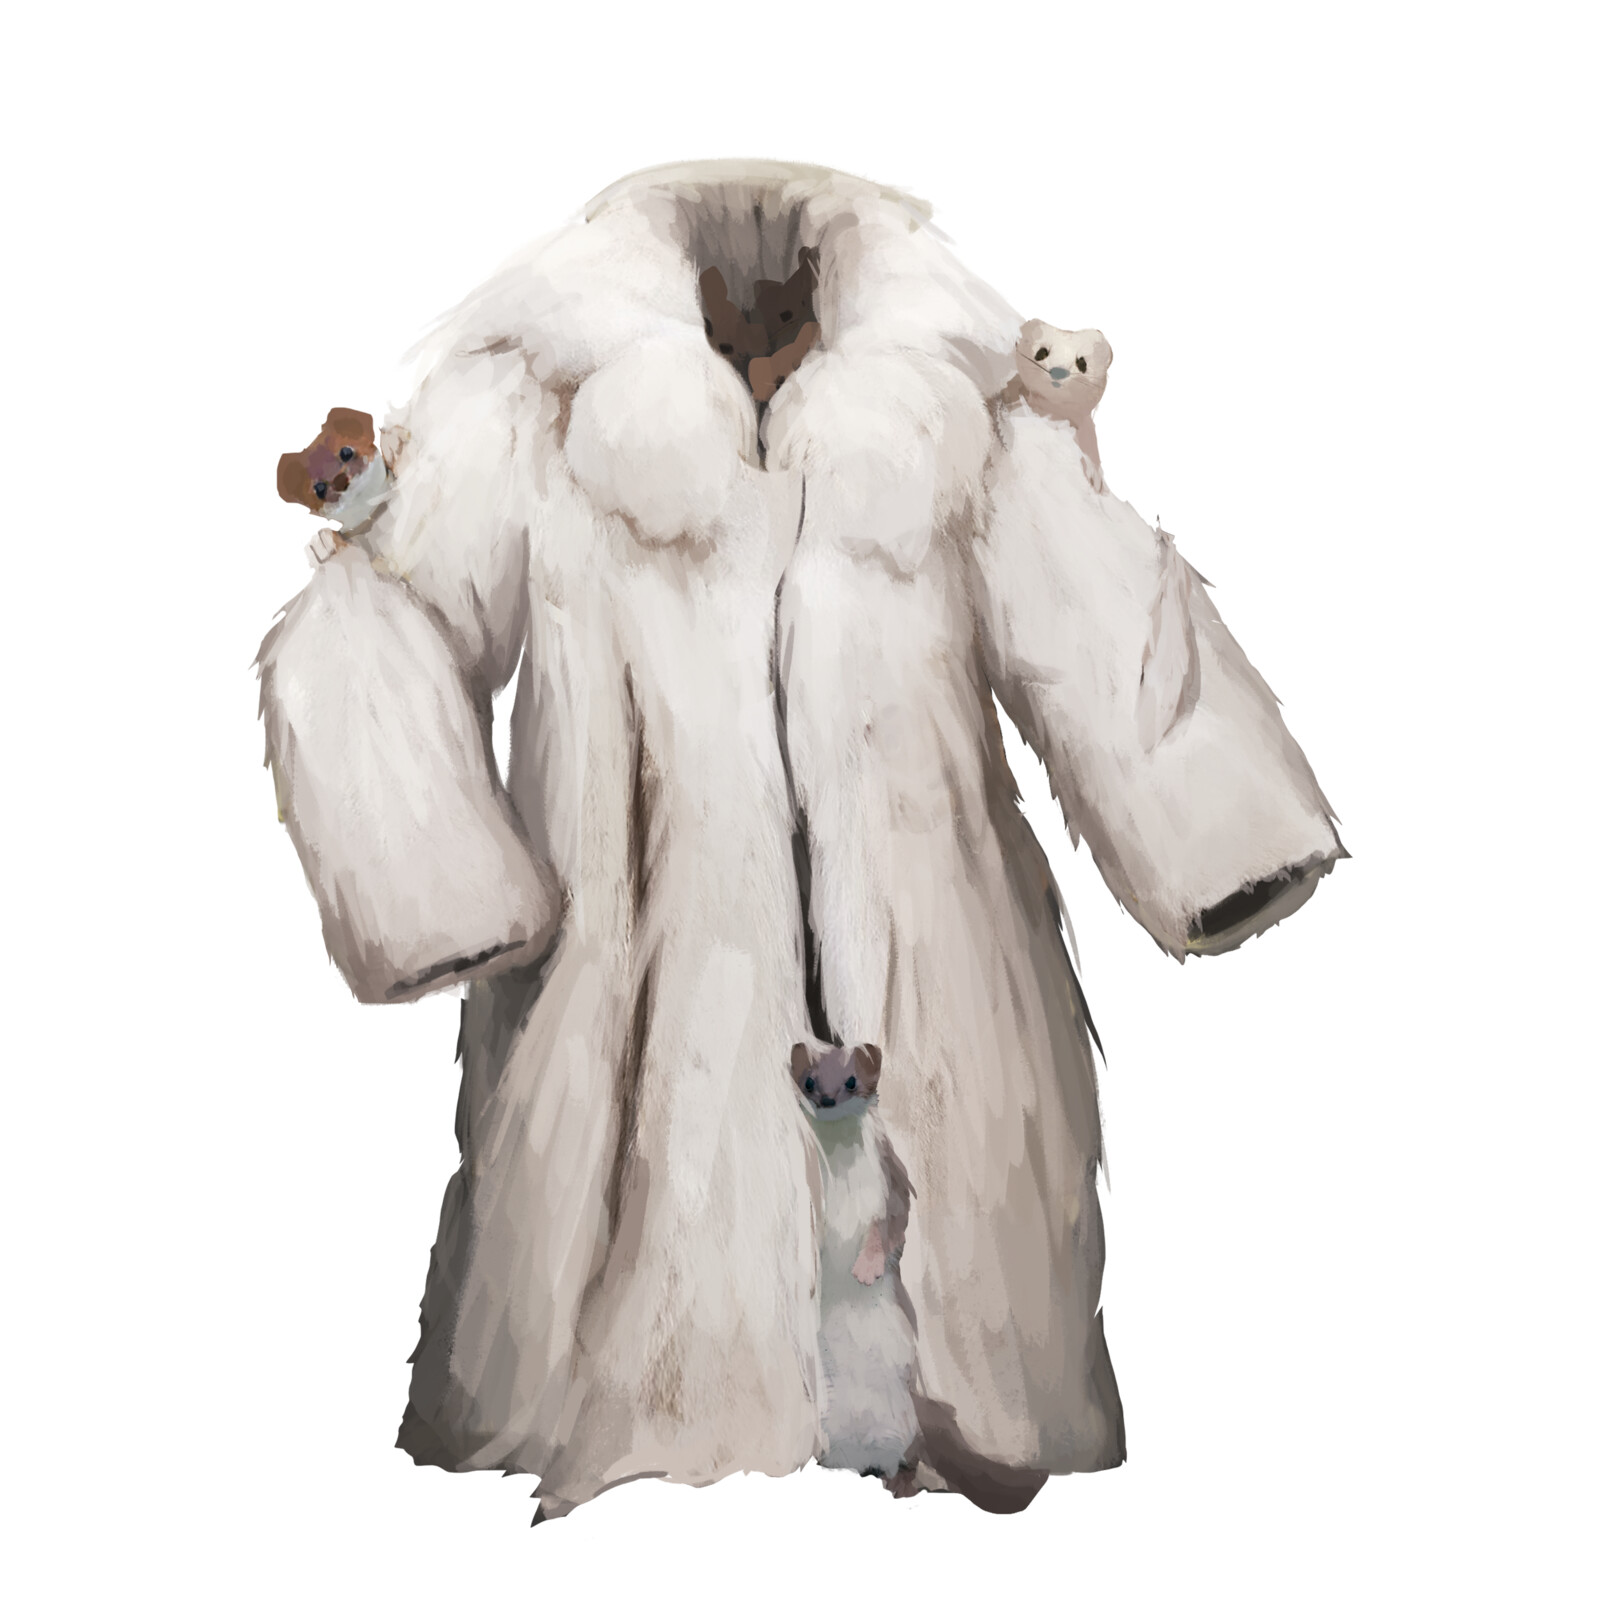 Coat of Many Pelts